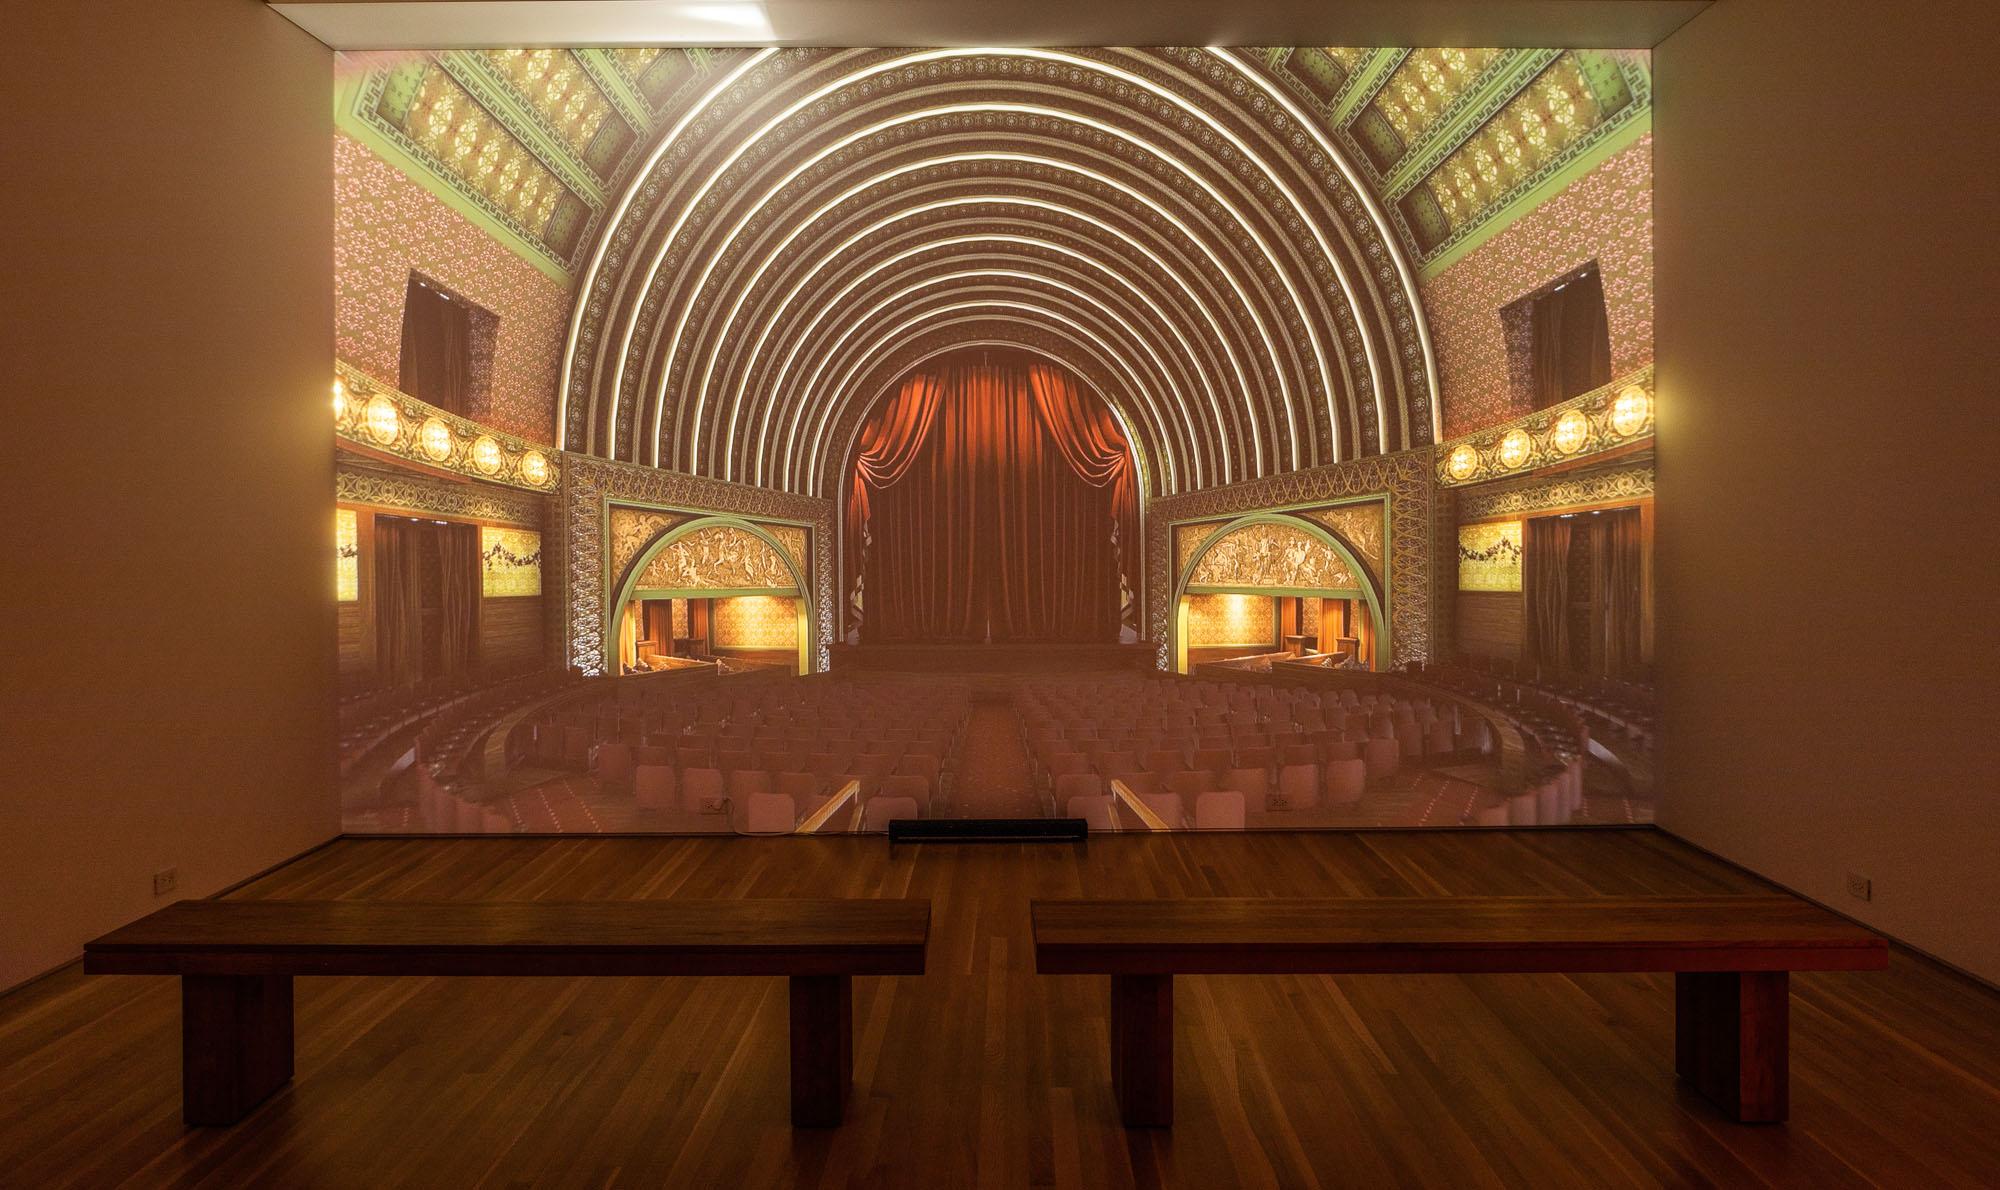 Interior Garrick Theater projection